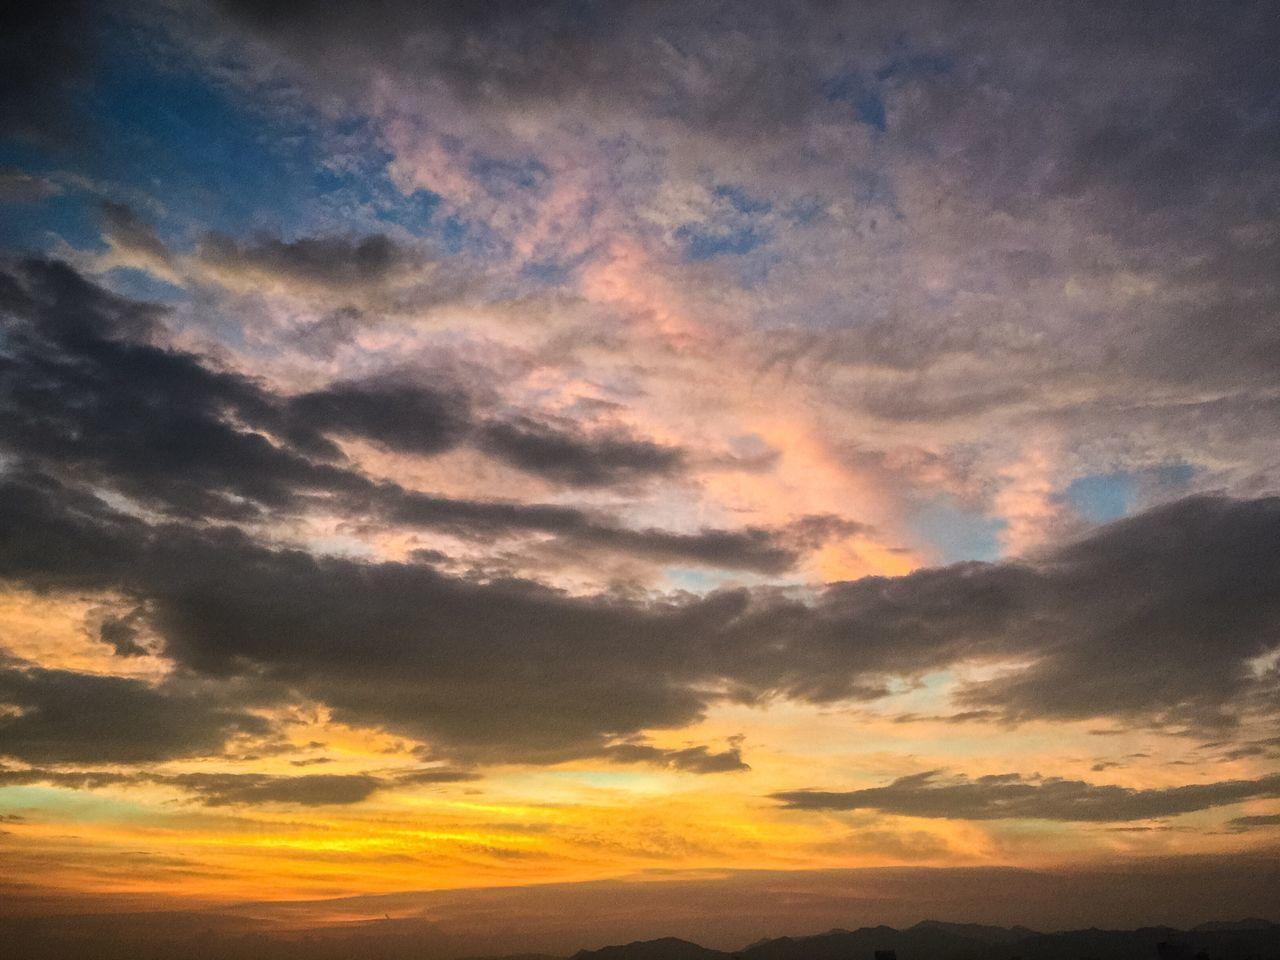 Sunset Scenics Beauty In Nature Tranquil Scene Tranquility Sky Majestic Cloudscape Dramatic Sky Nature Cloud - Sky Cloud Atmospheric Mood Atmosphere Orange Color Outdoors Moody Sky Multi Colored Calm Non-urban Scene China Zhuhai